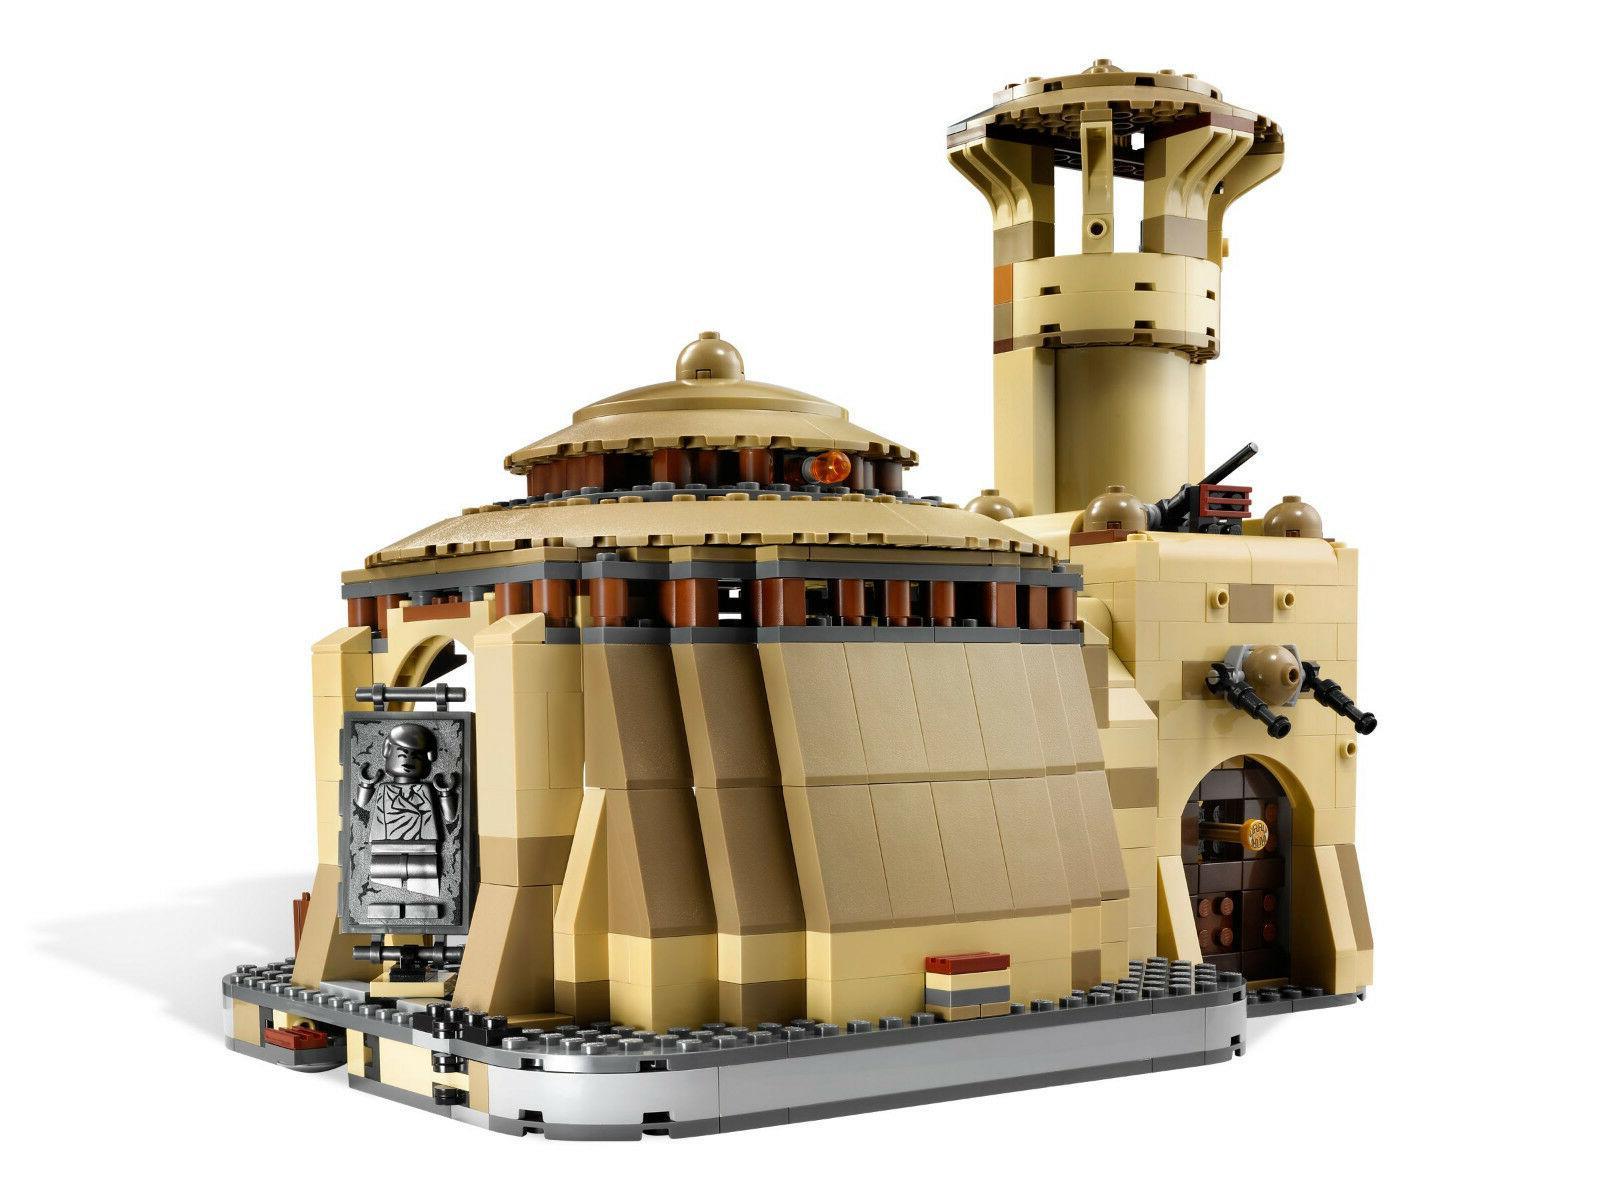 LEGO WARS PALACE NISB - RETIRED OF THE JEDI